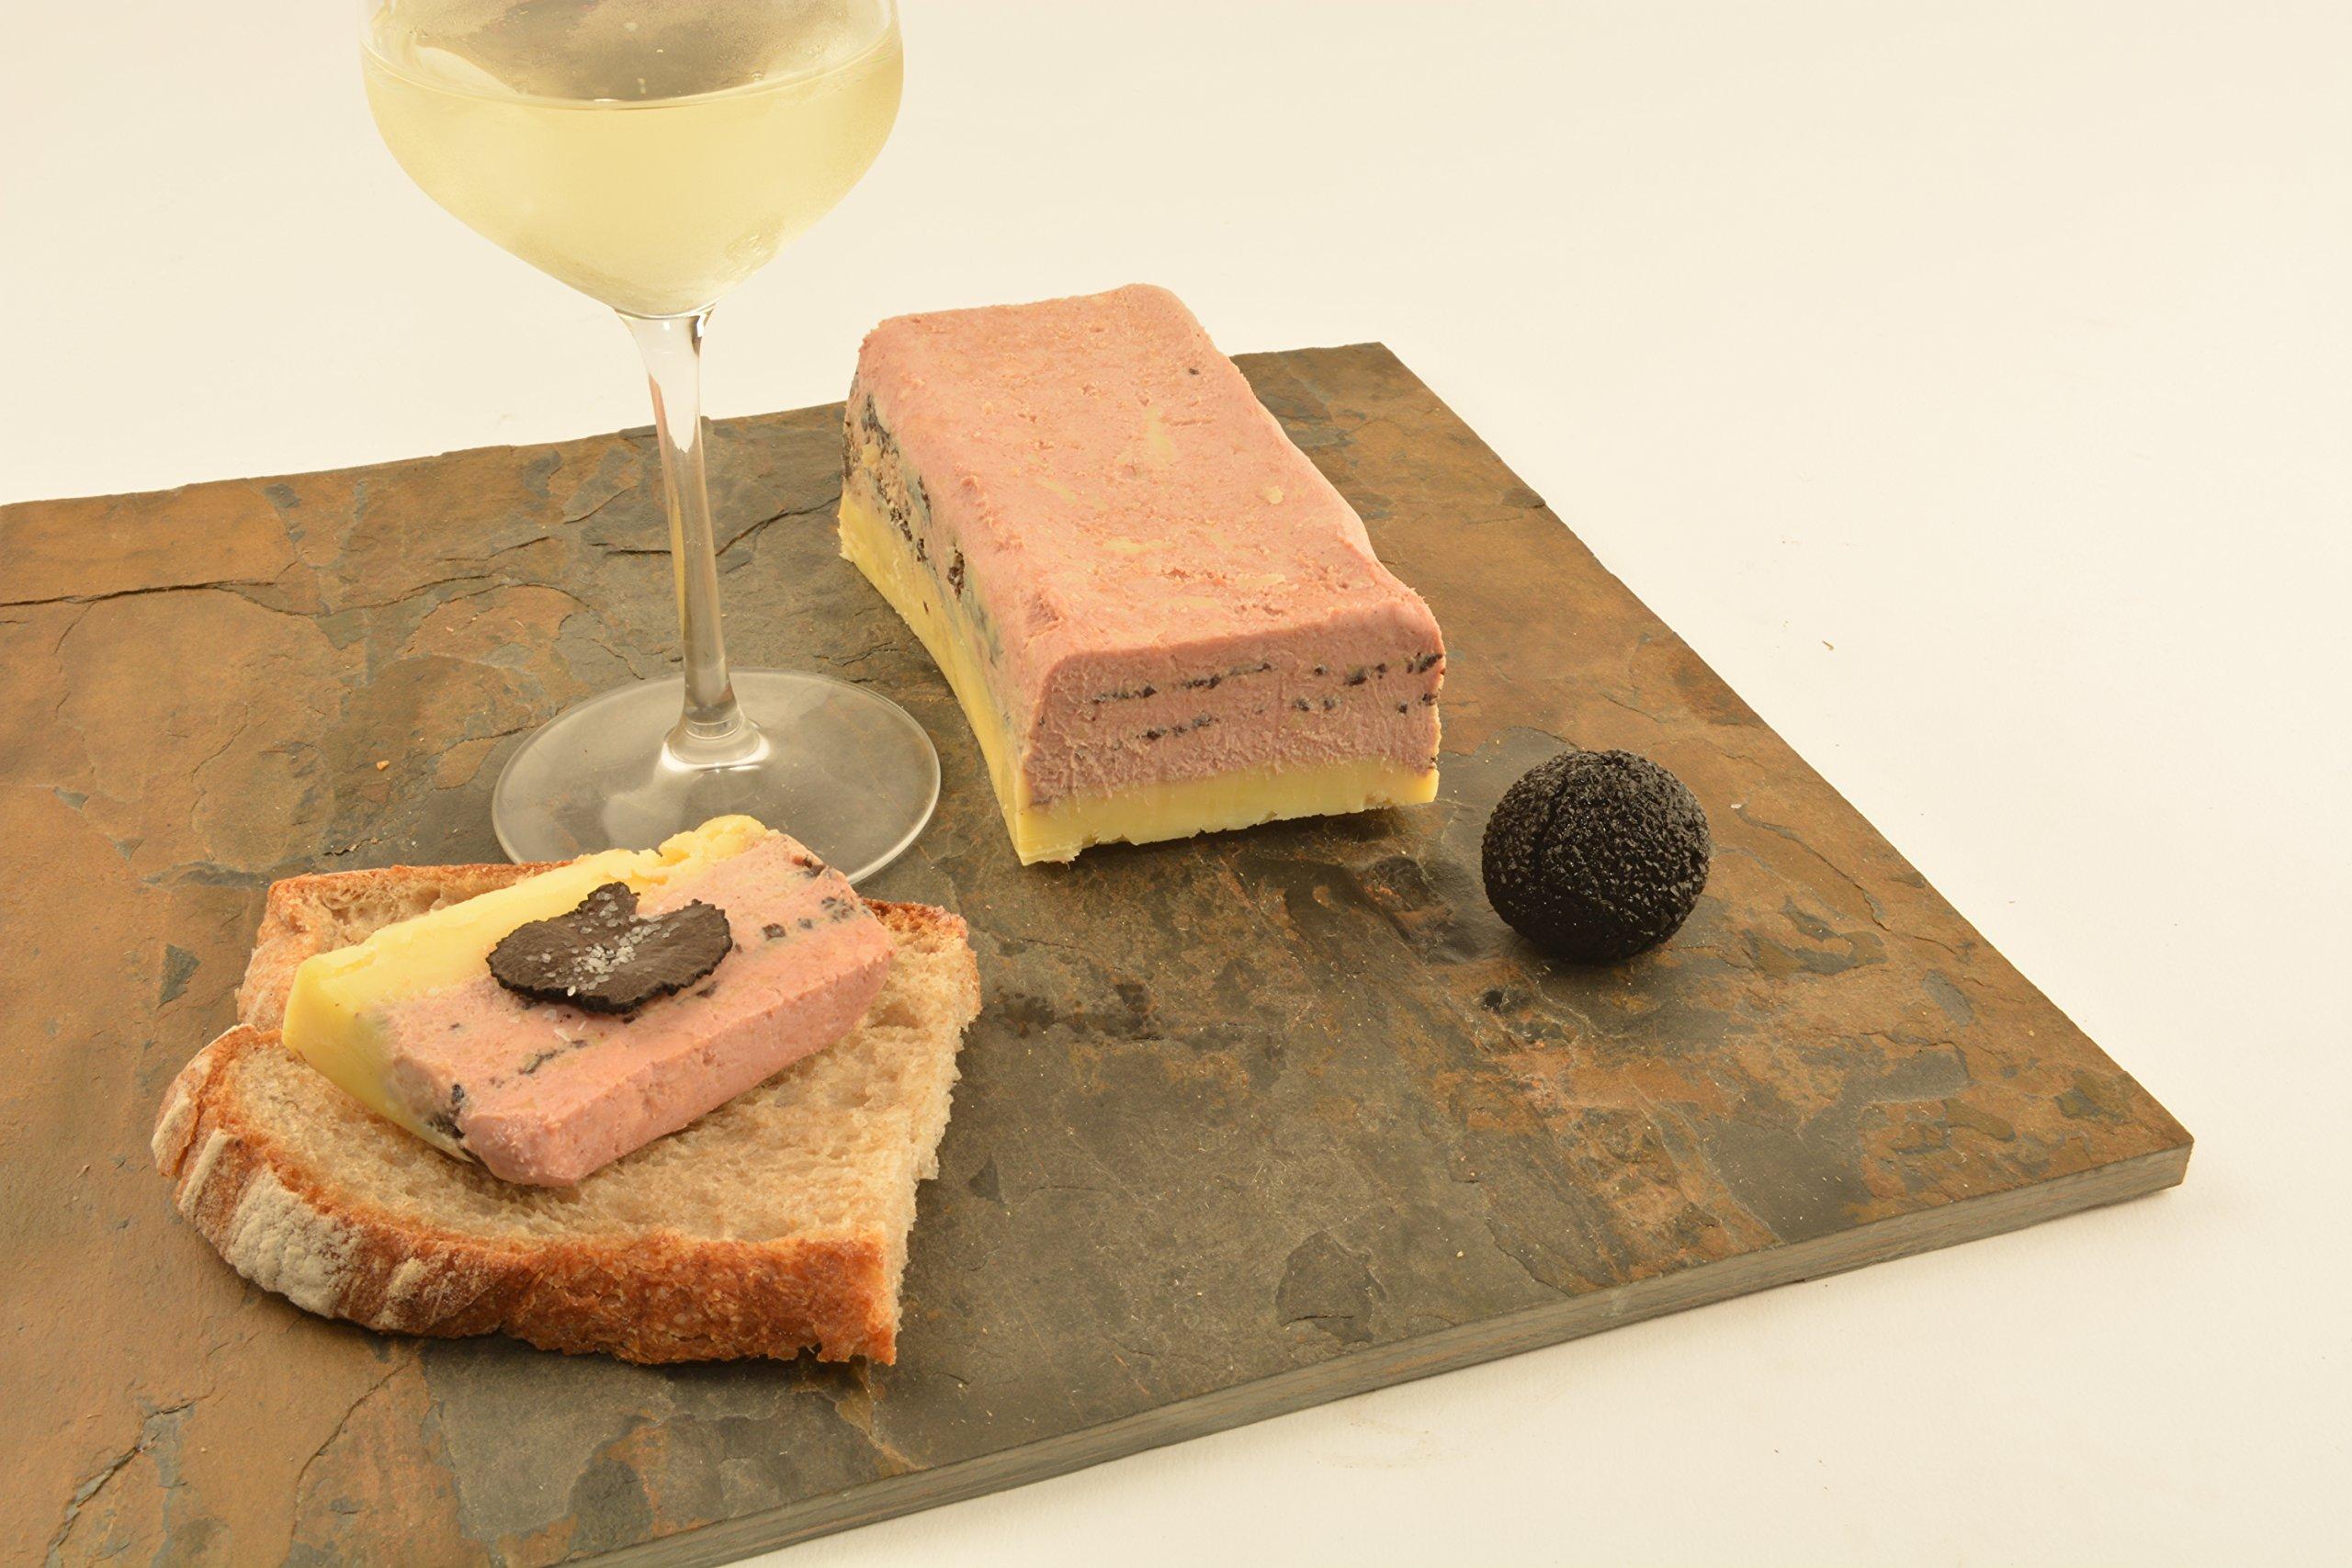 Foie Gras Terrine with Black Truffles, 1.3lbs